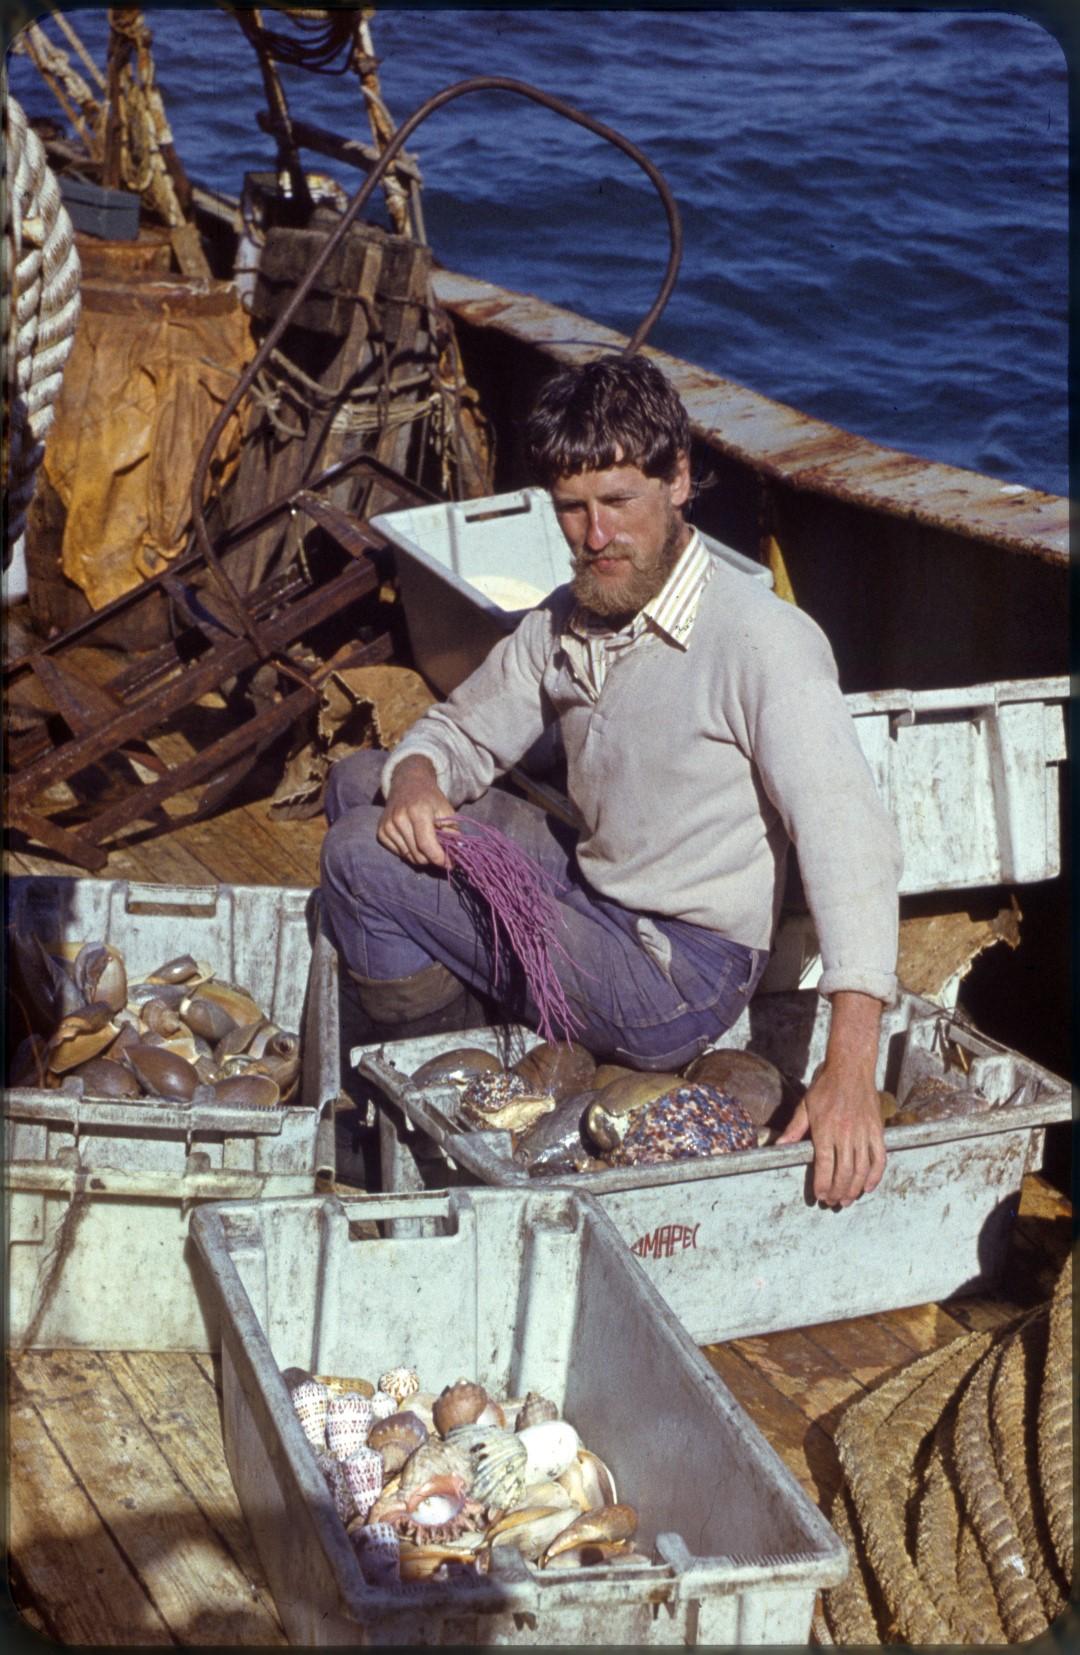 Ekspedicija Centriniame Rytų Atlante, 1975 m. | ljm.lt nuotr.